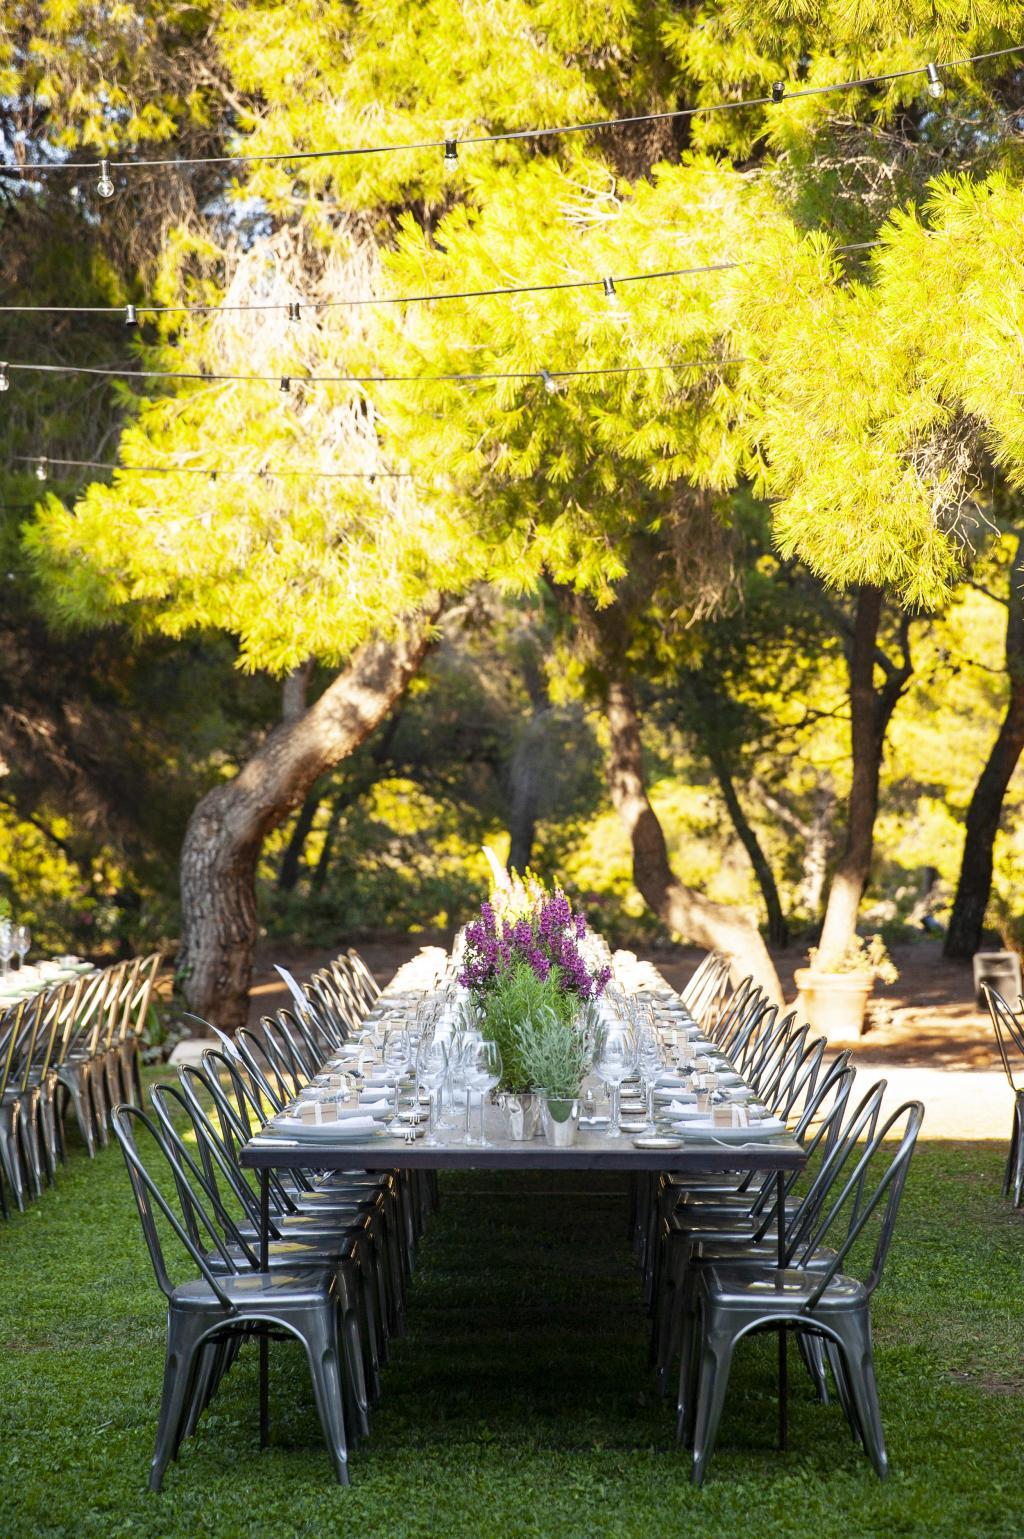 I&M Sinterina wedding - Image 13